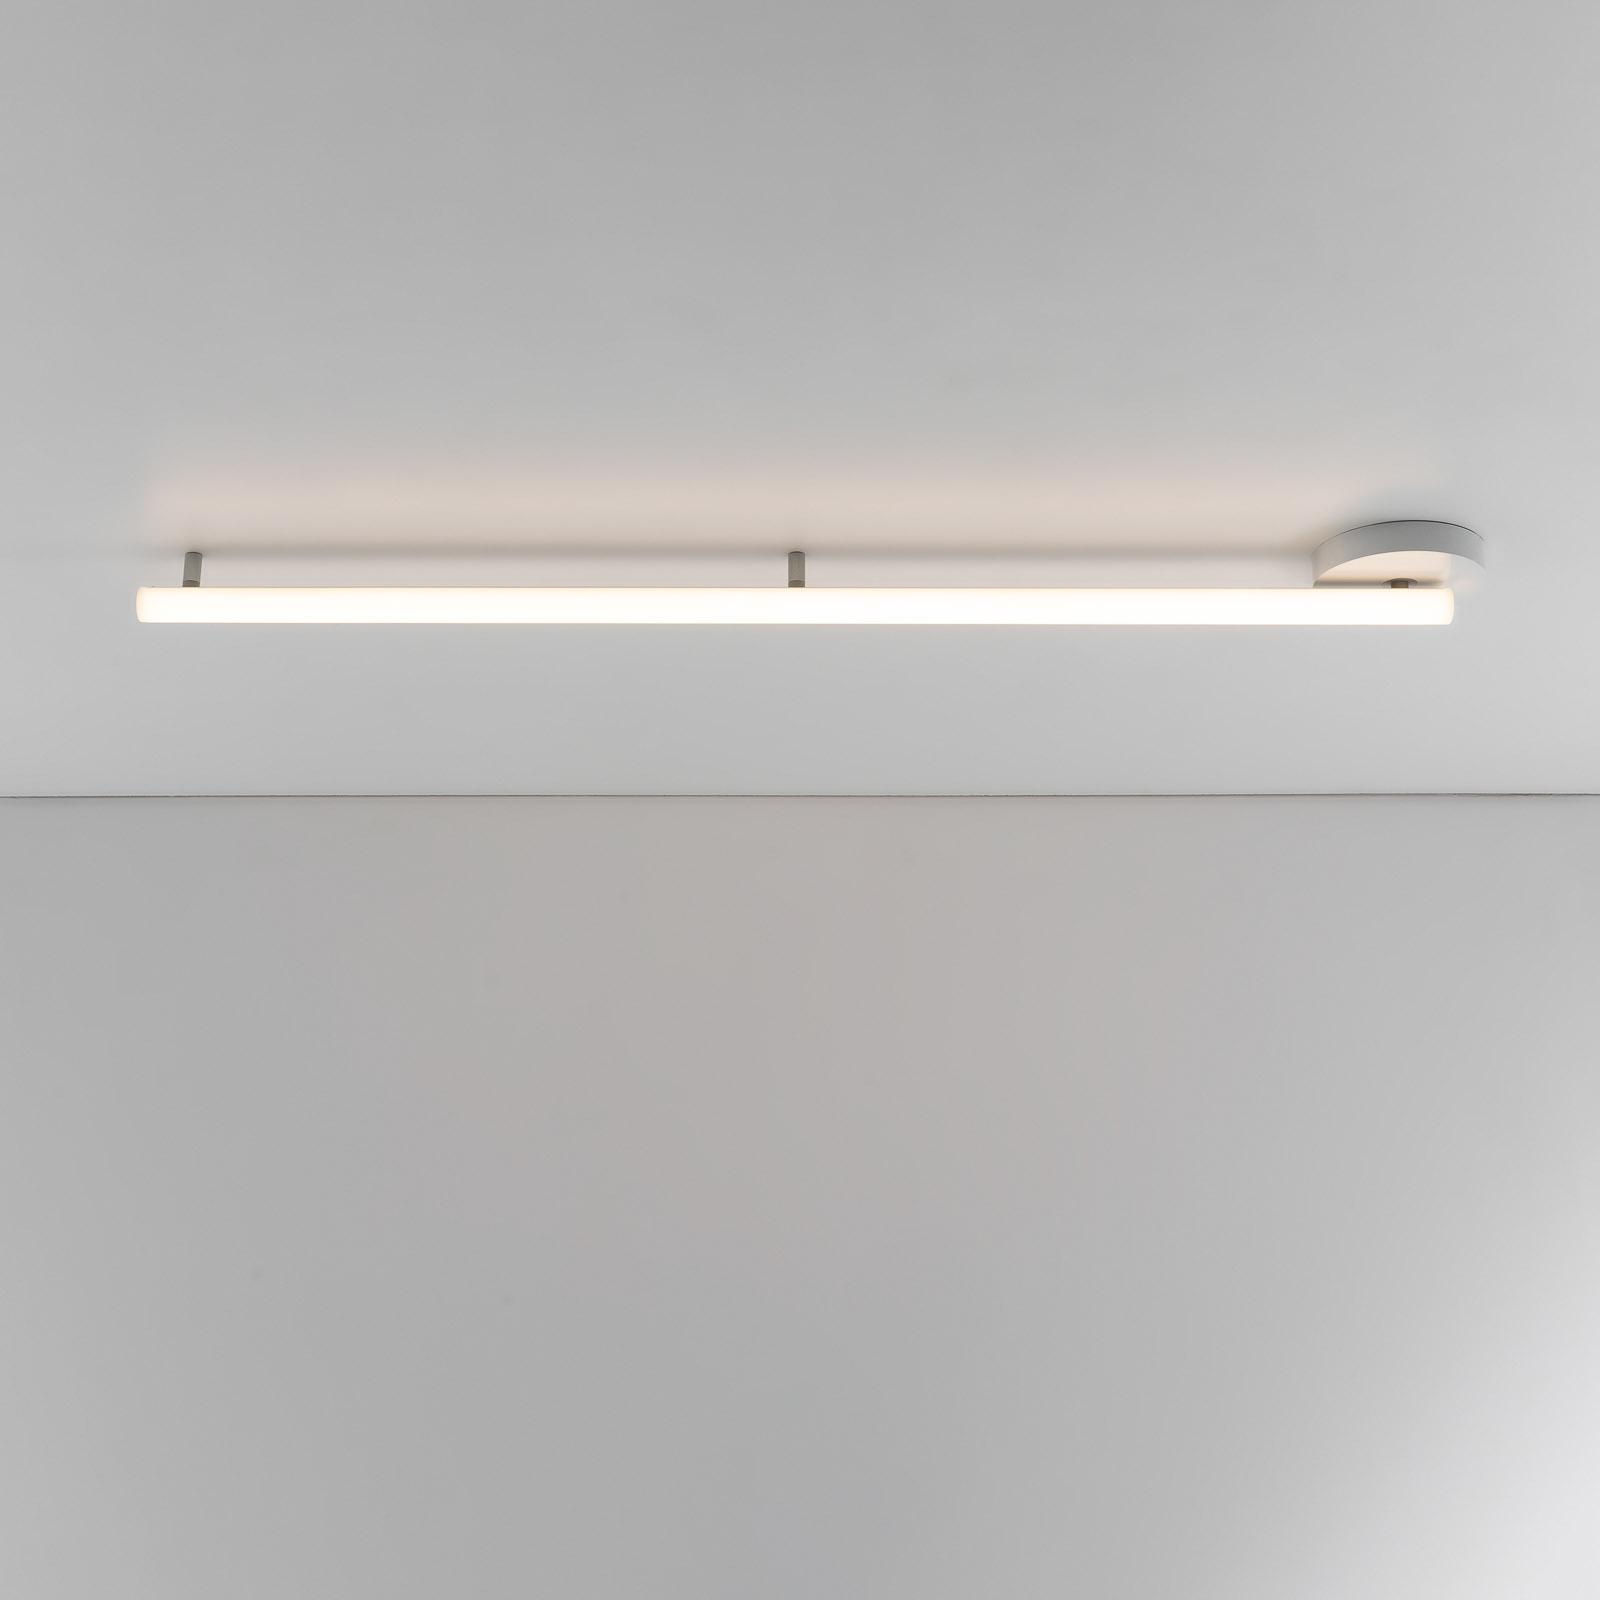 Artemide Alphabet of light linear Decke App 180